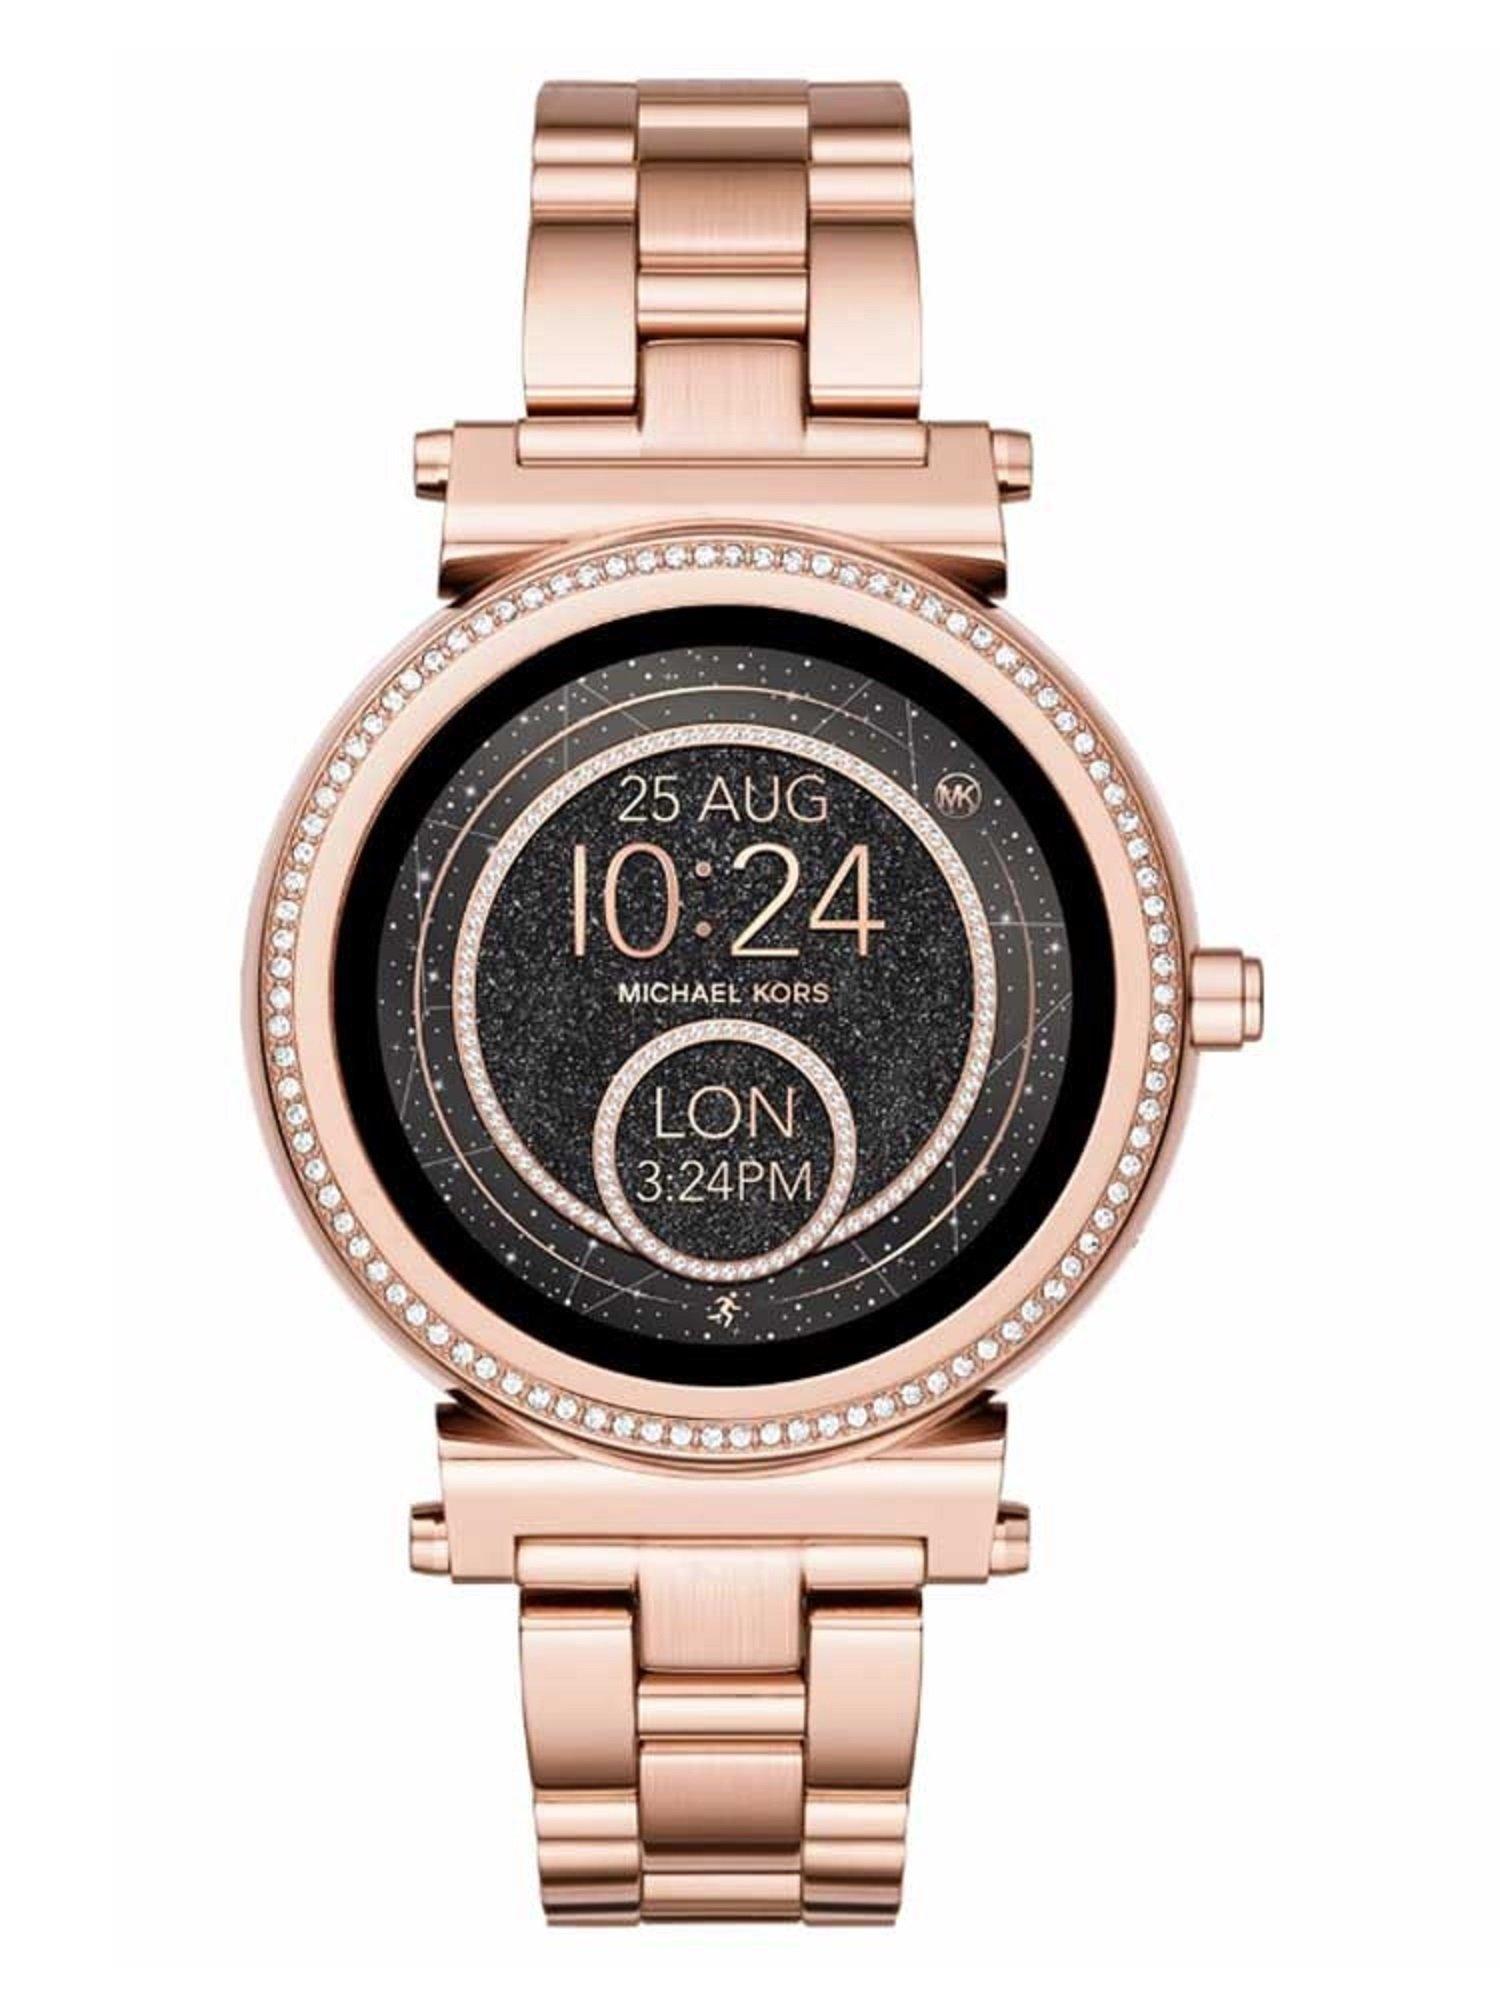 Michael Kors Rose Gold Crystal Sofie Gen Smart Watch by Michael Kors